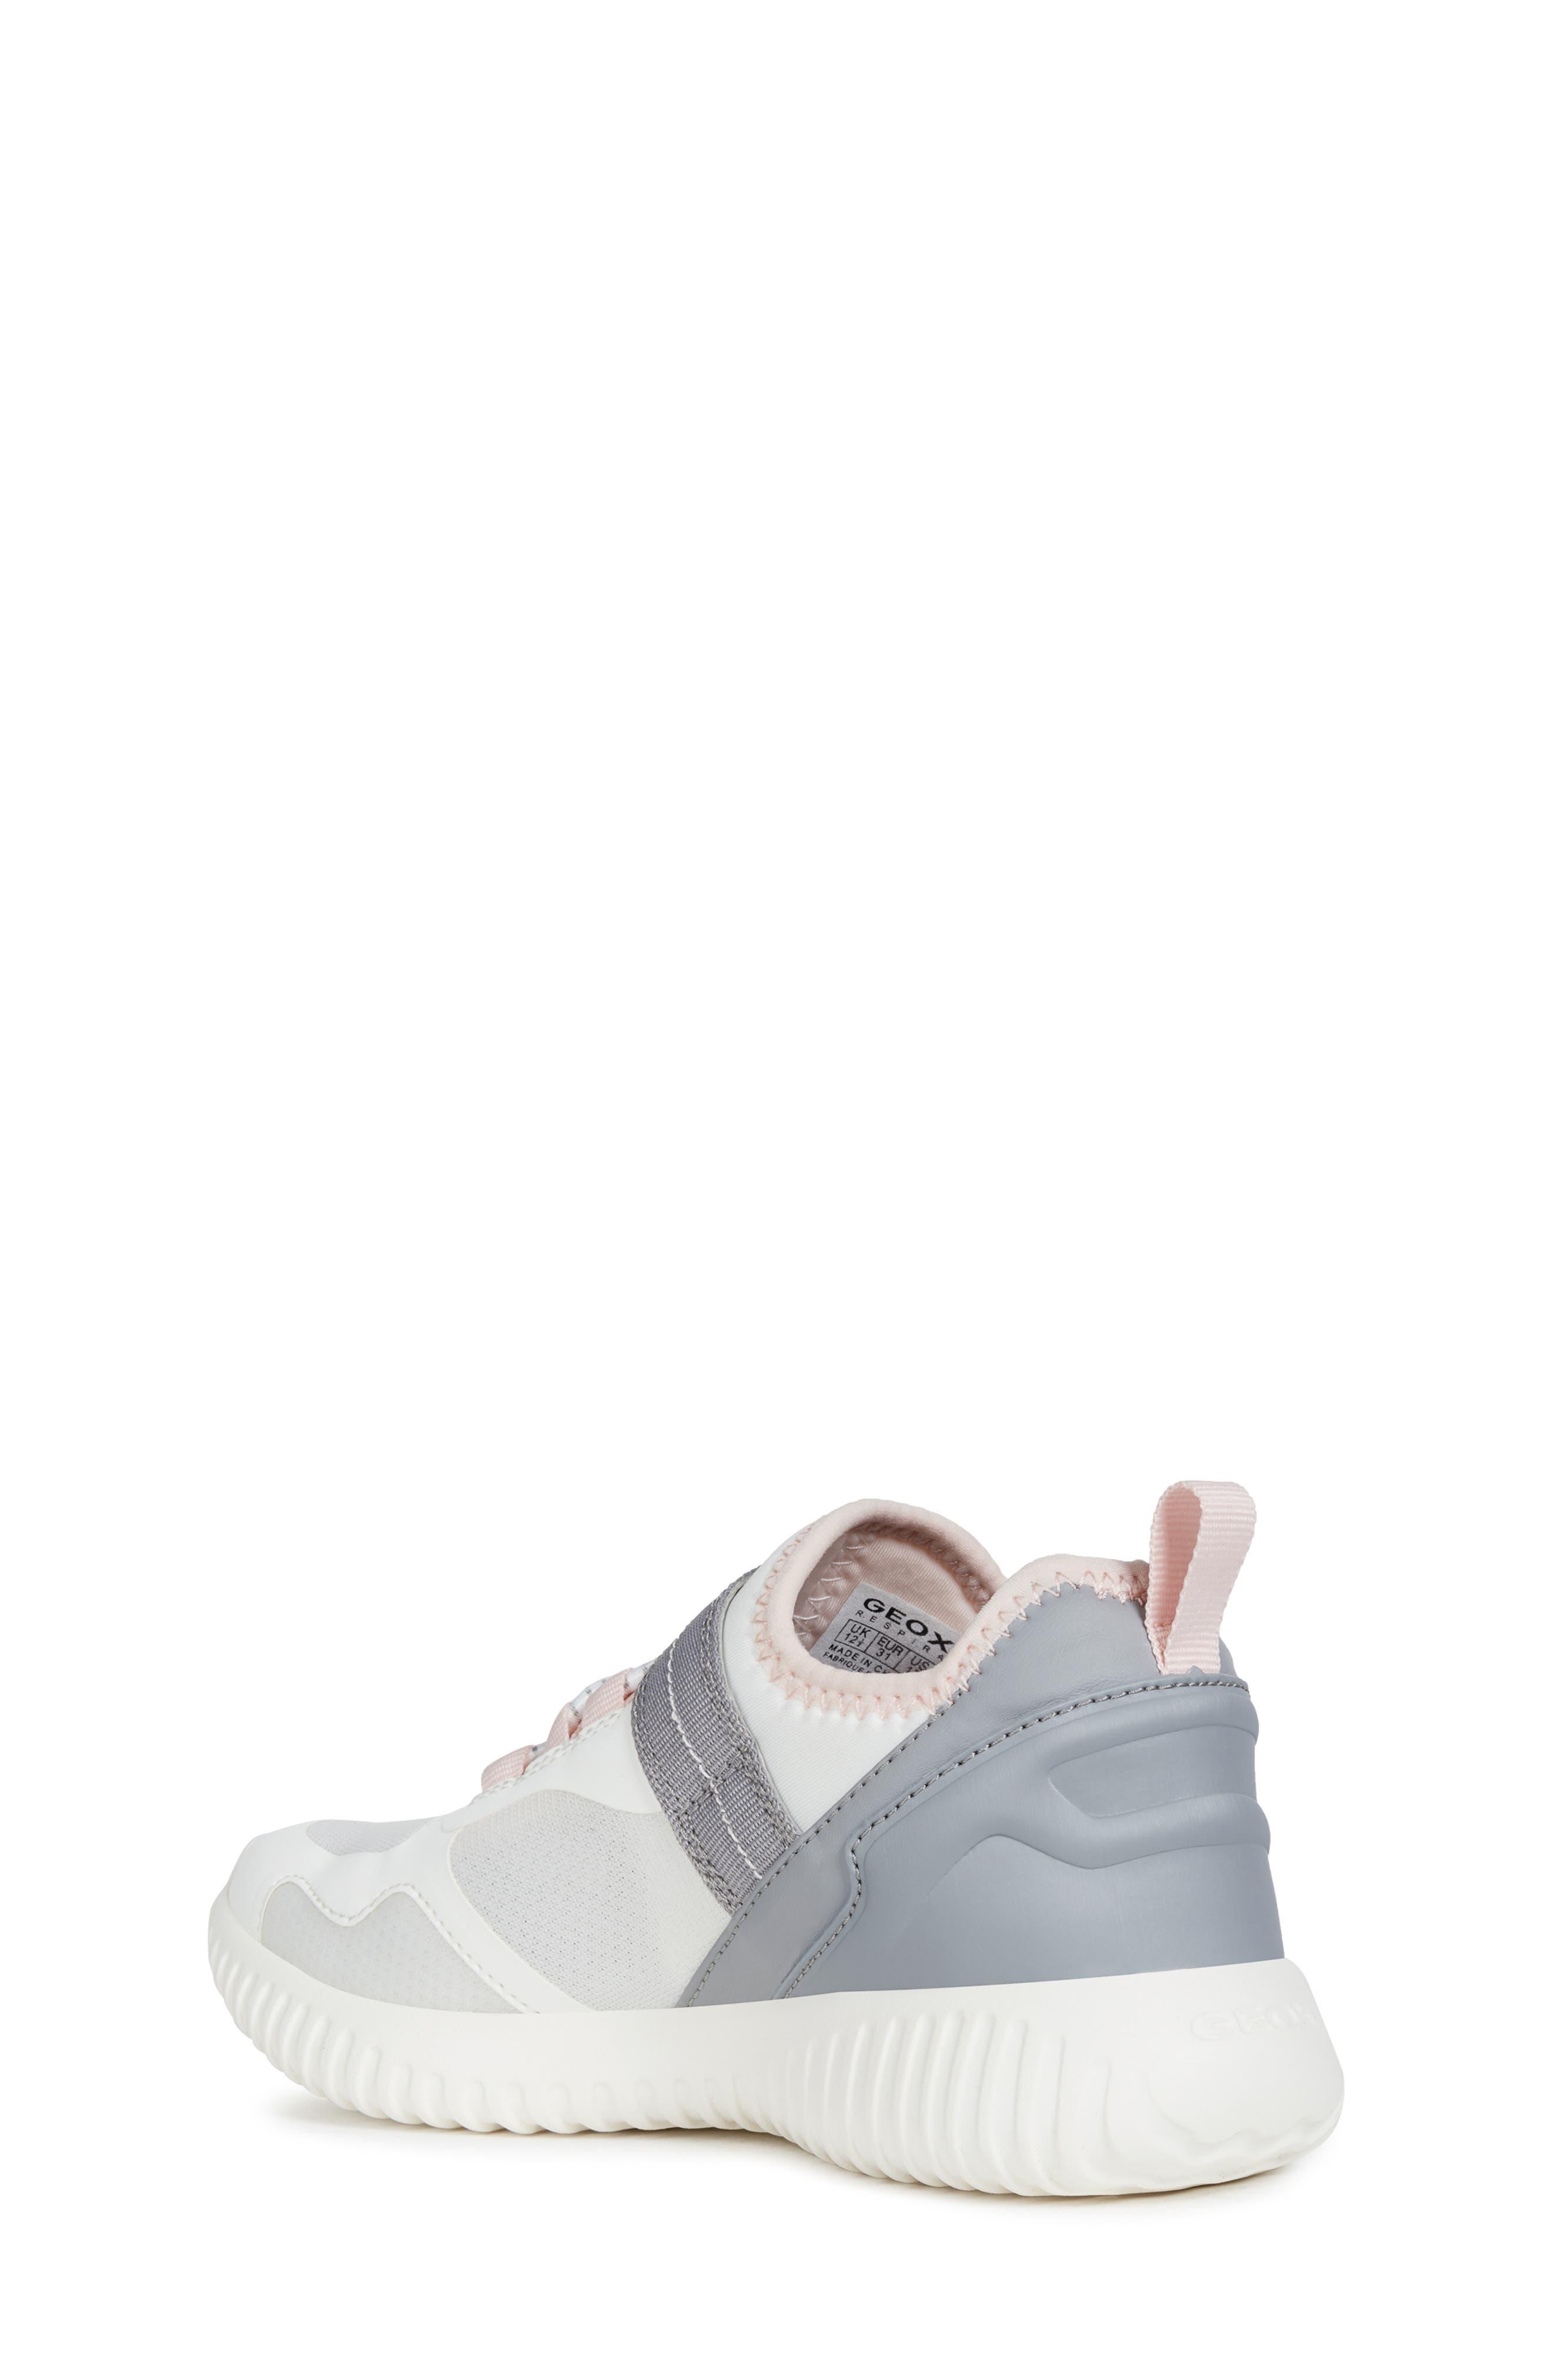 GEOX, Waviness Sneaker, Alternate thumbnail 2, color, WHITE/ GREY